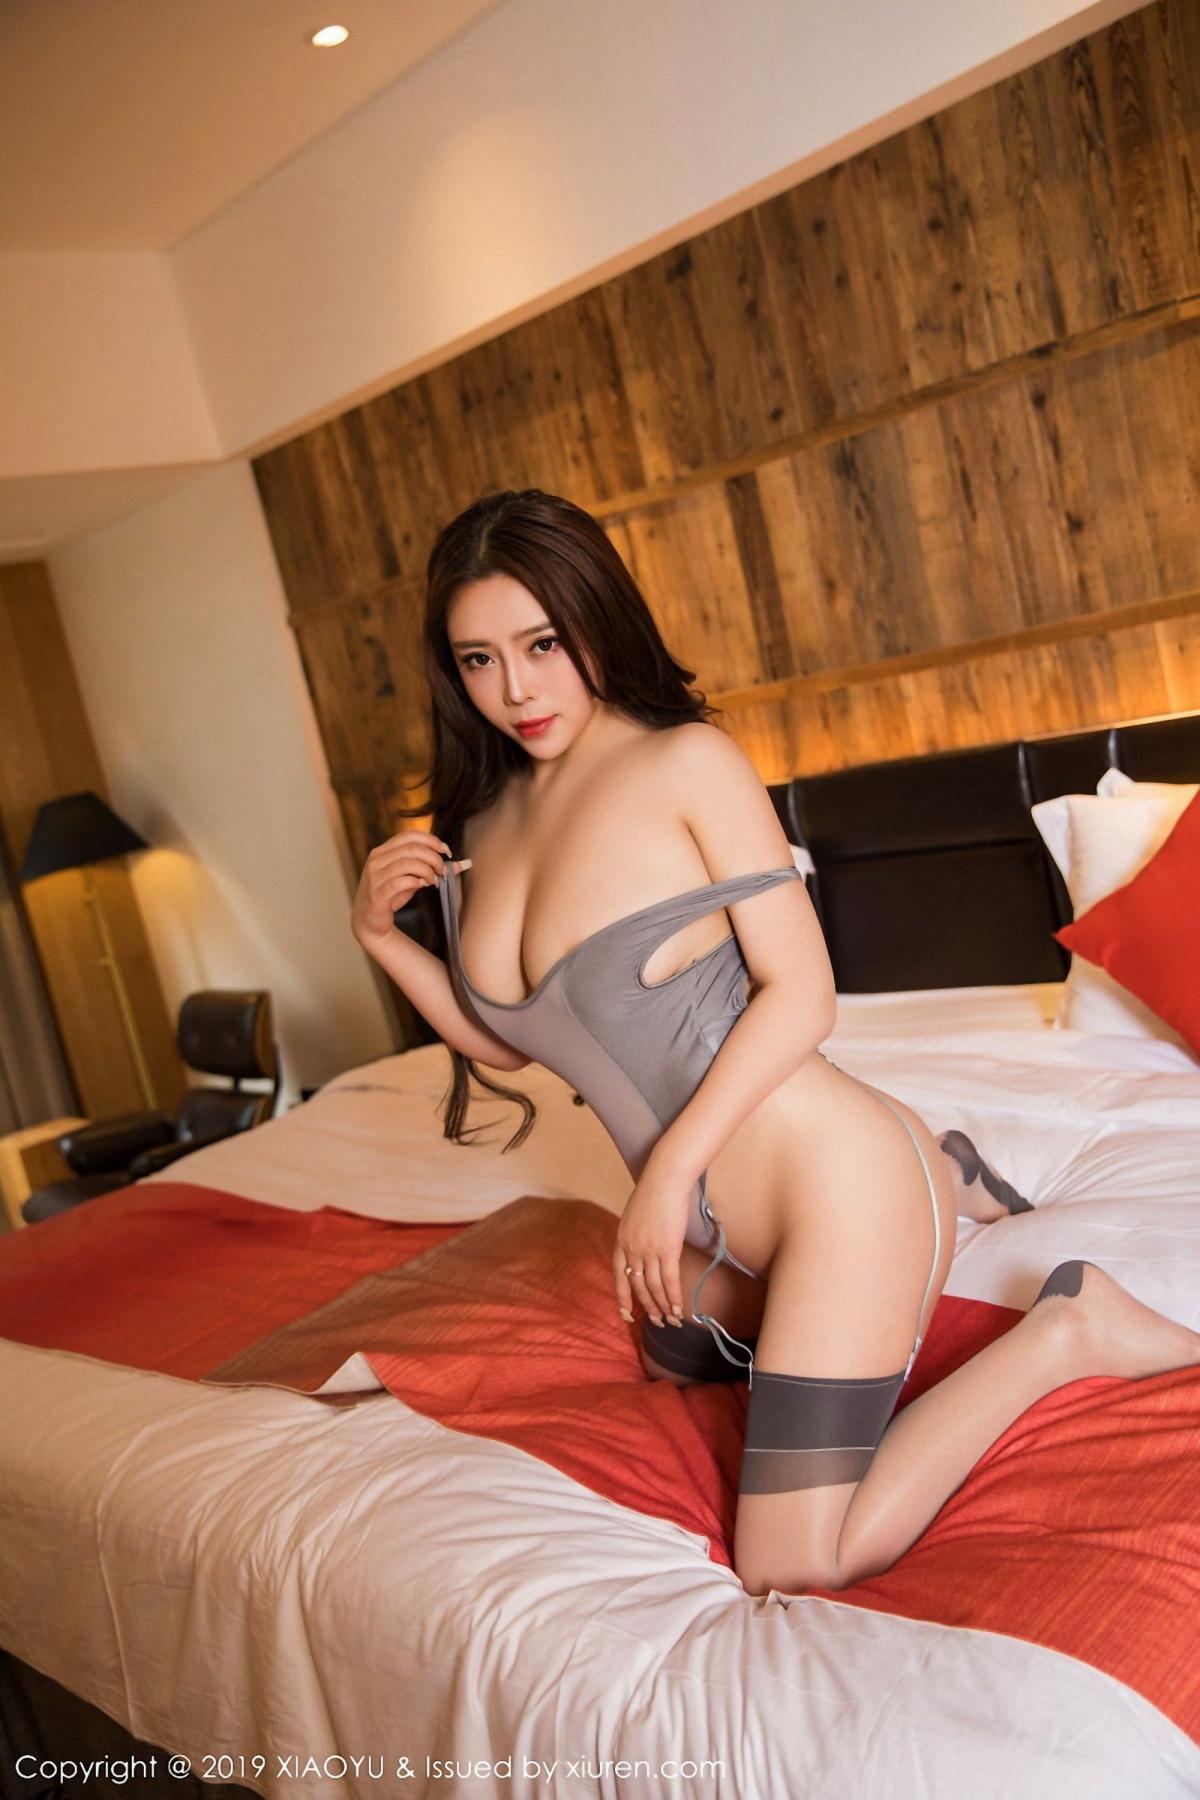 [XiaoYu] Vol.038 Miki Tu 29P, Miki Tu, XiaoYu